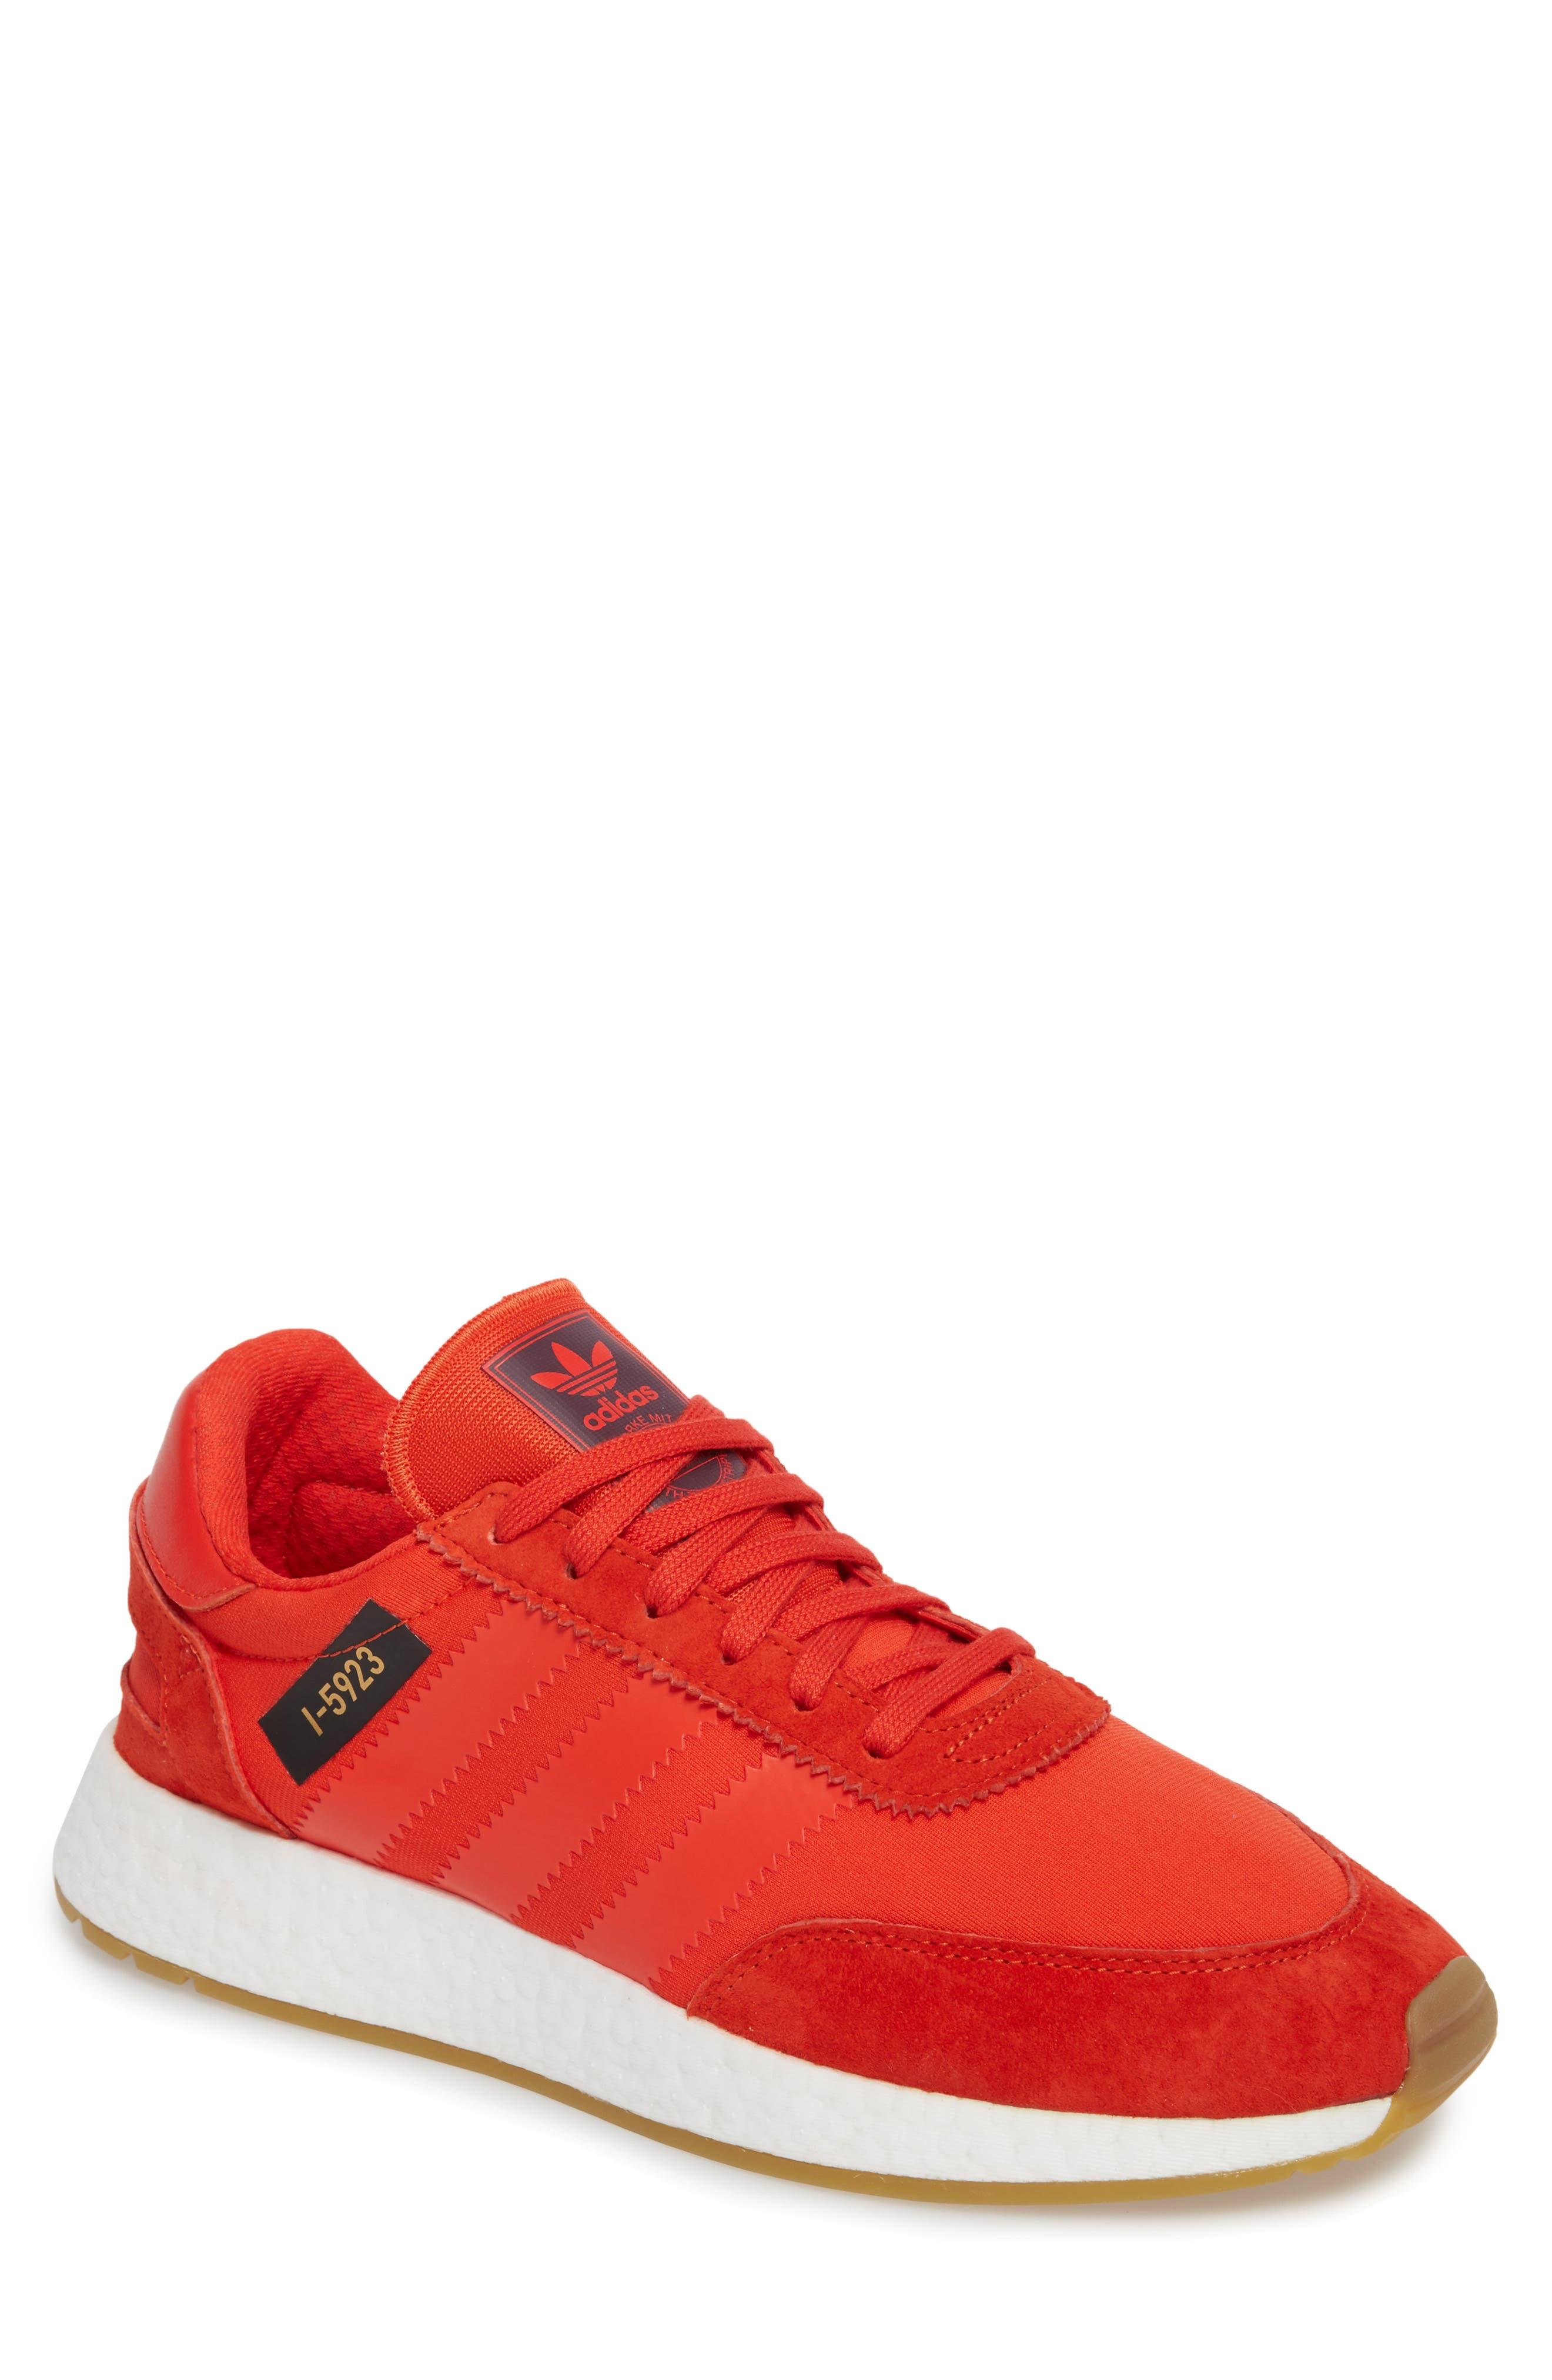 Alternate Image 1 Selected - adidas I-5923 Sneaker (Men)